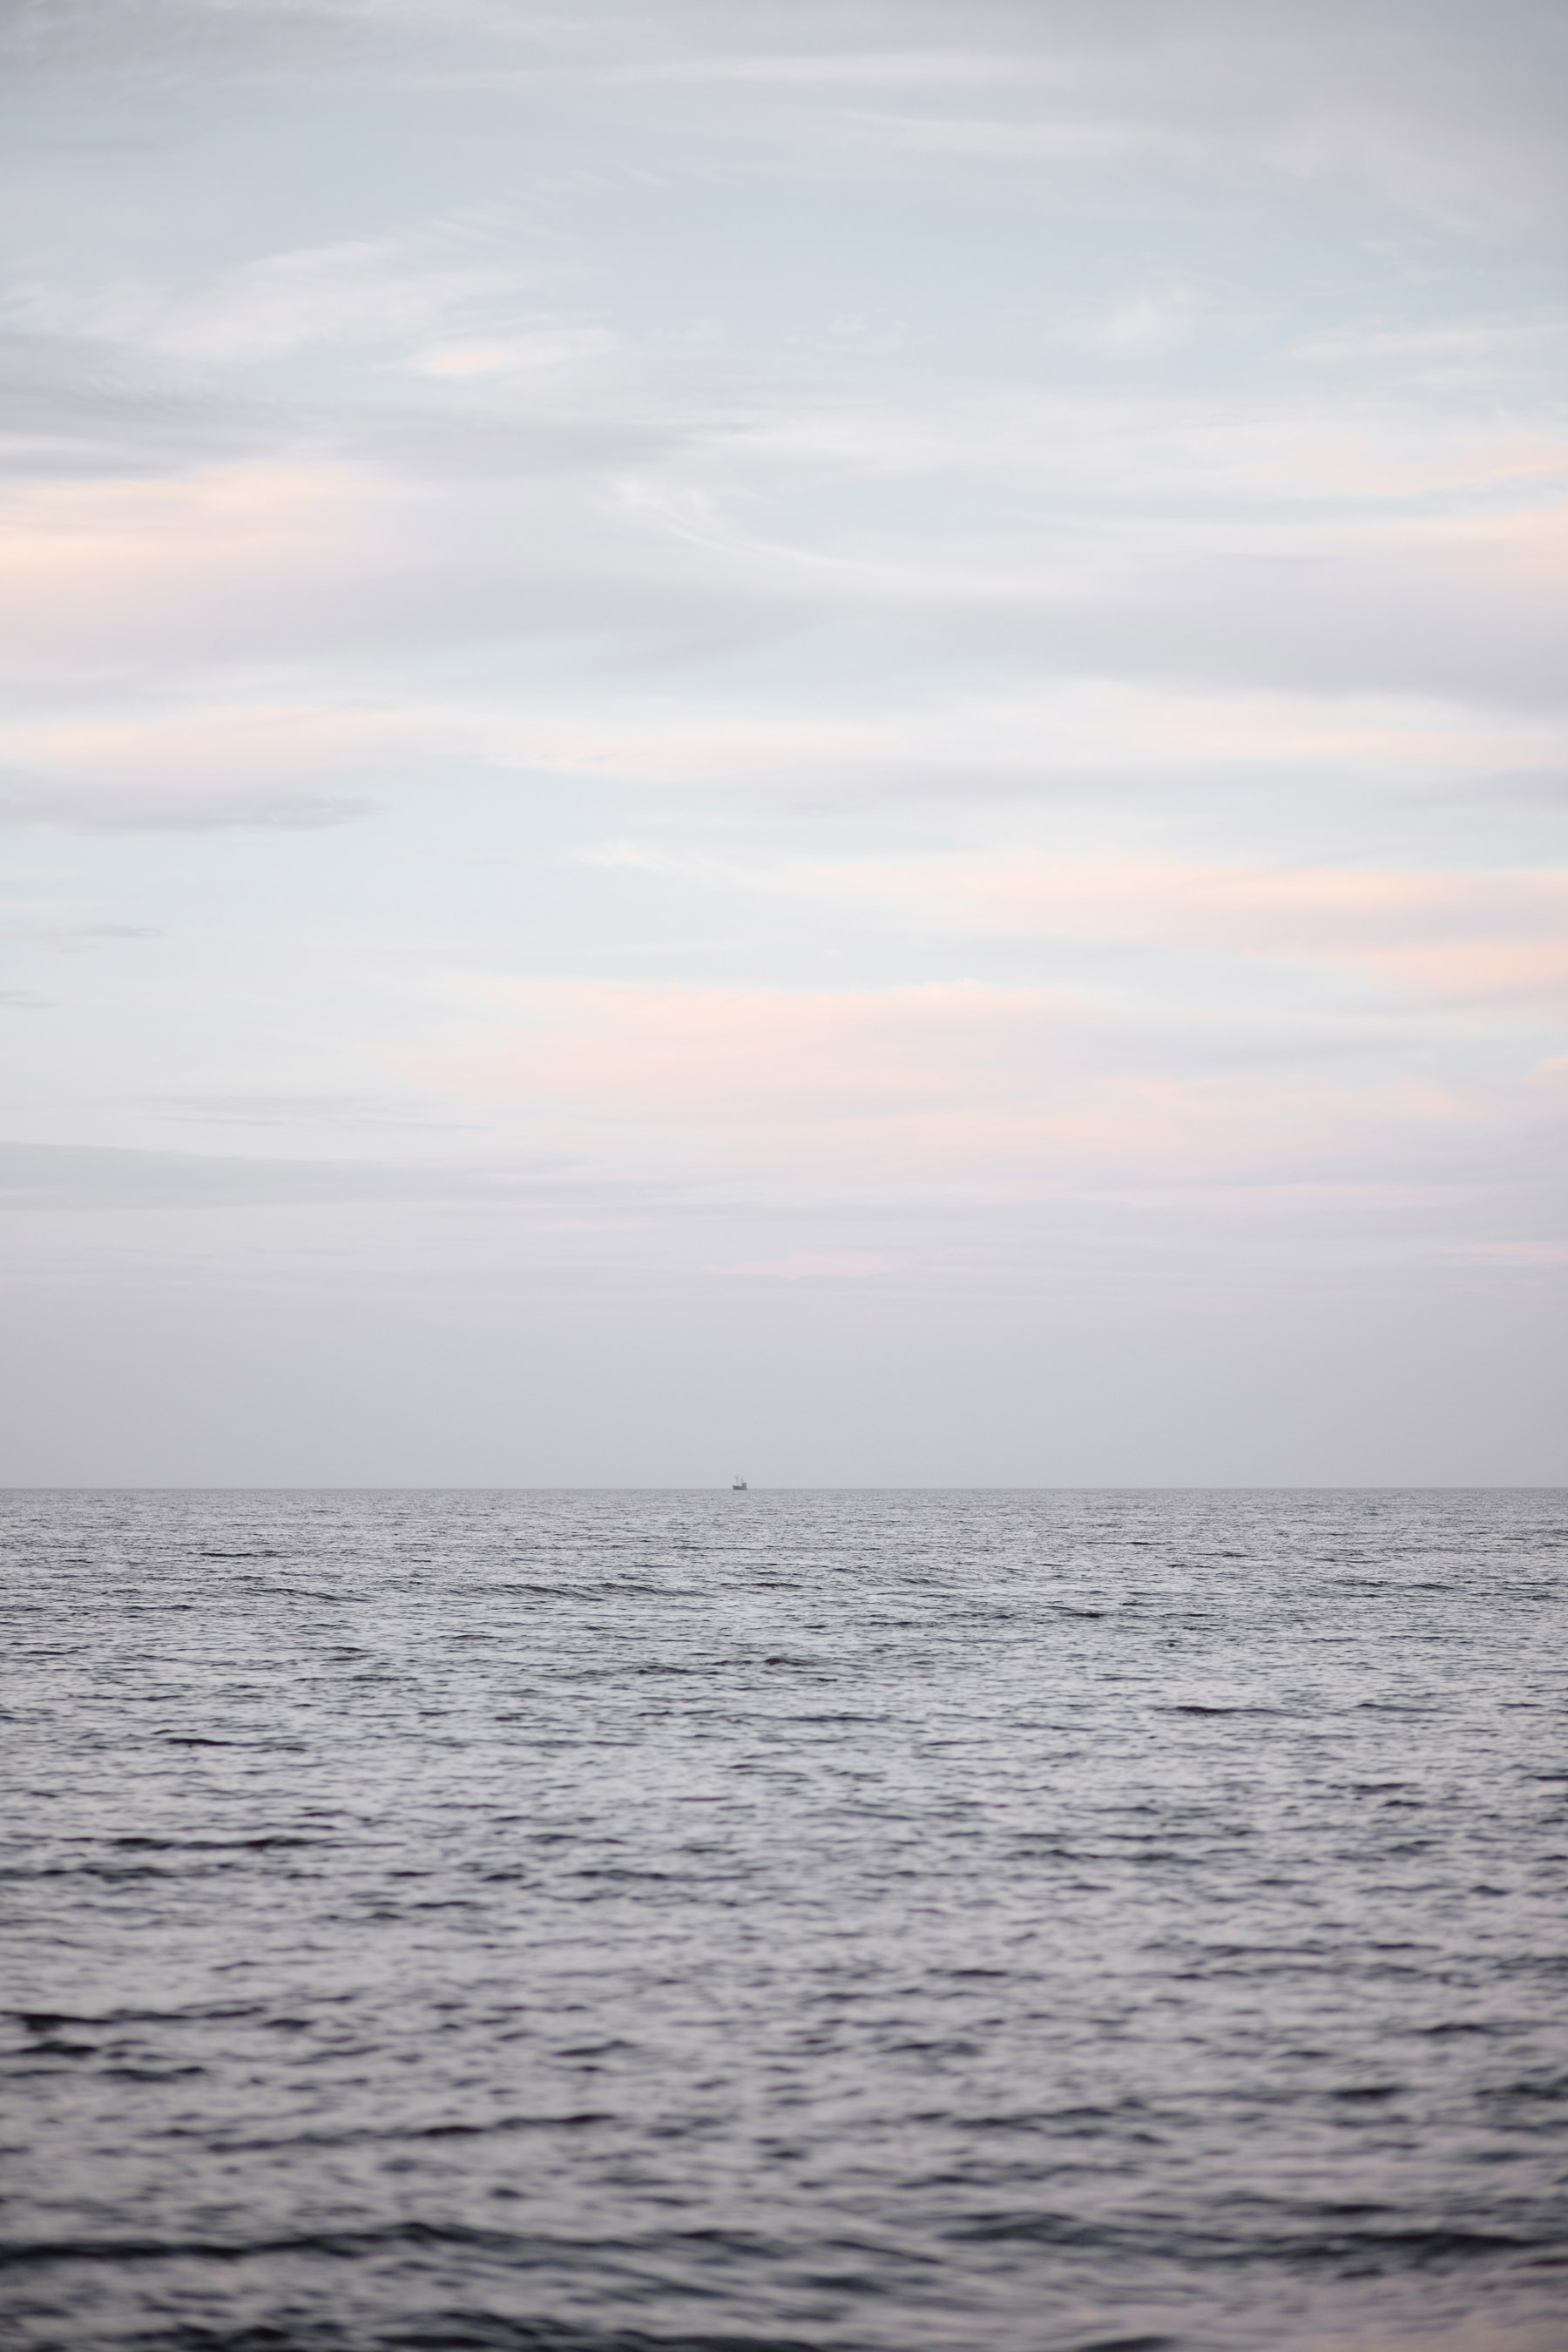 krajobraz nad morzem